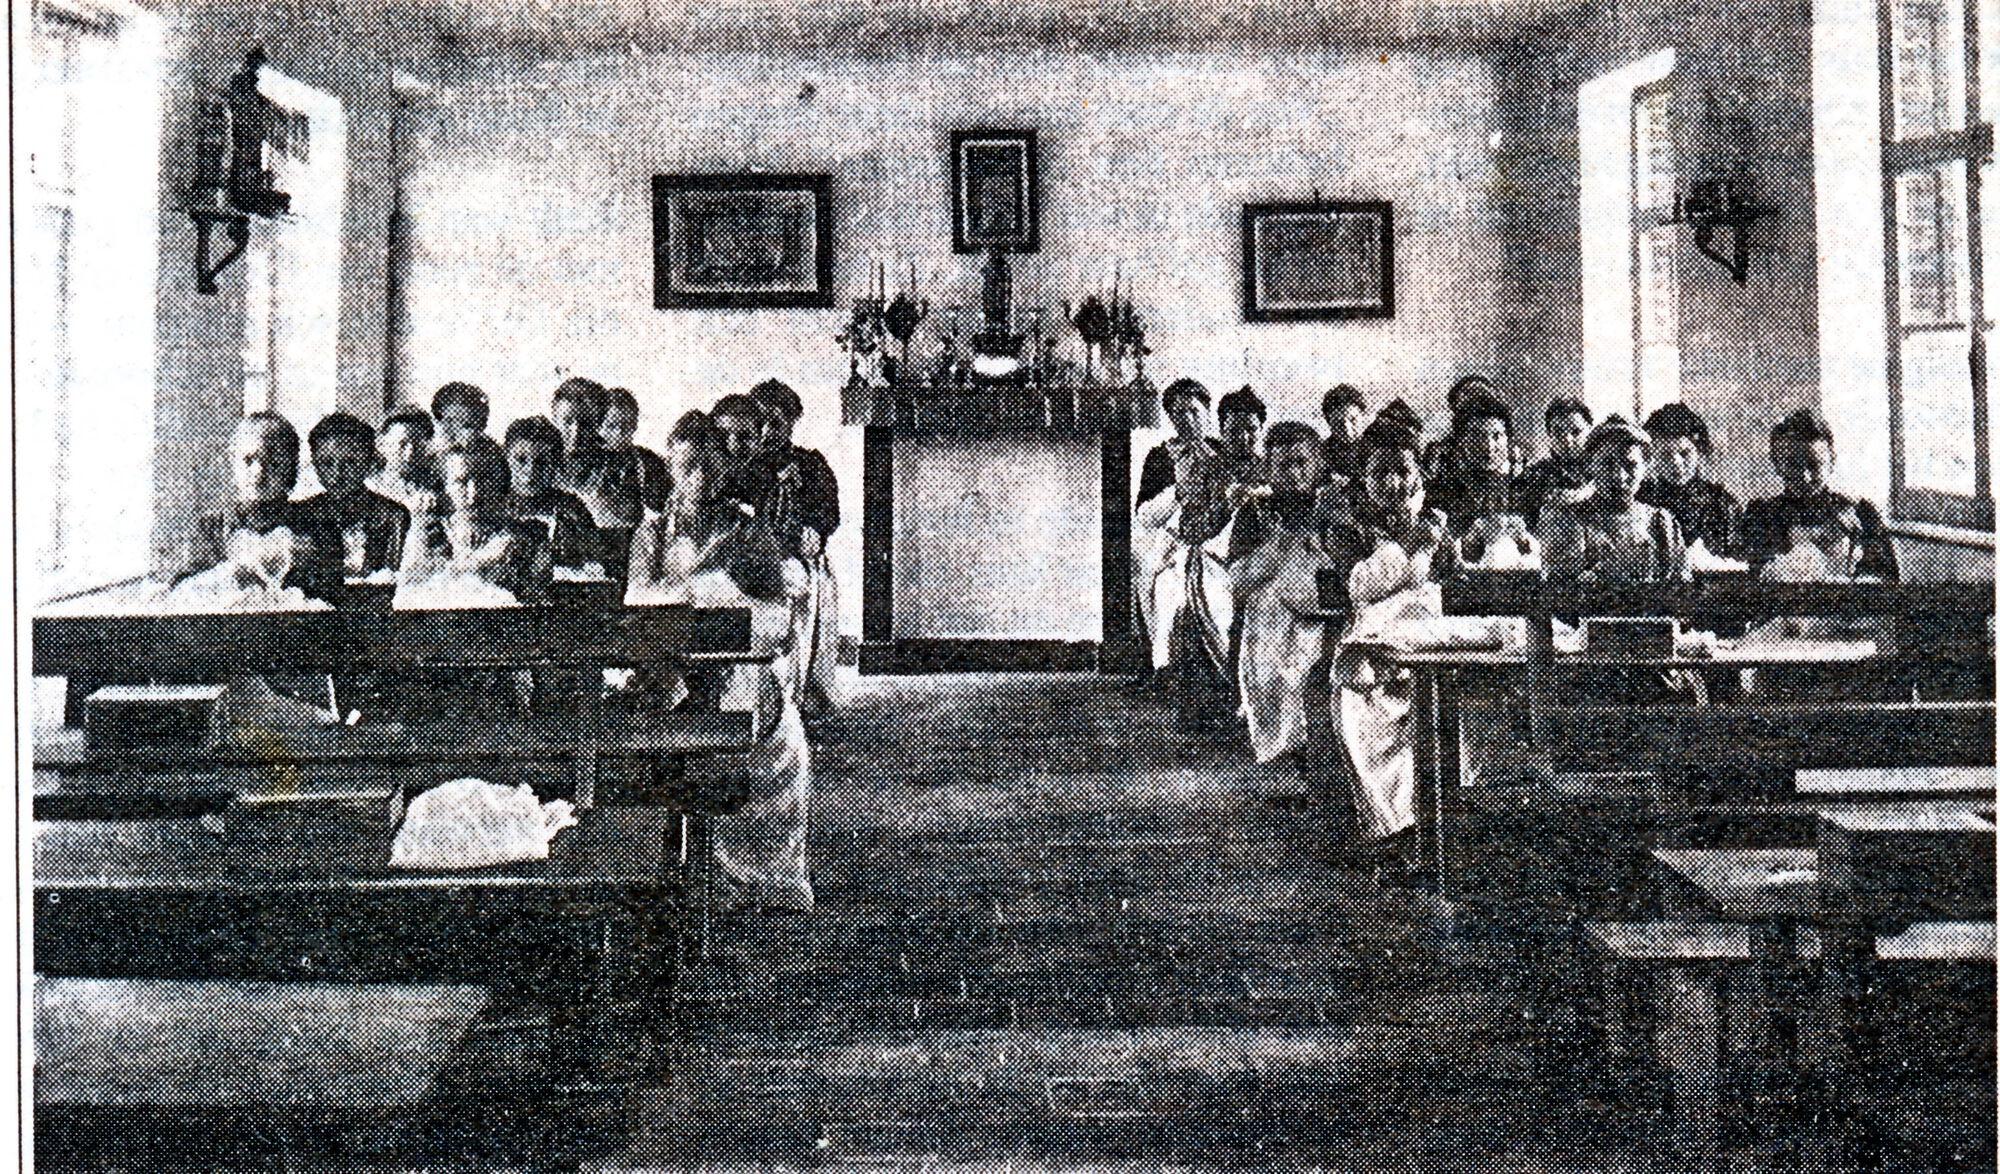 Borgerschool Deftinge